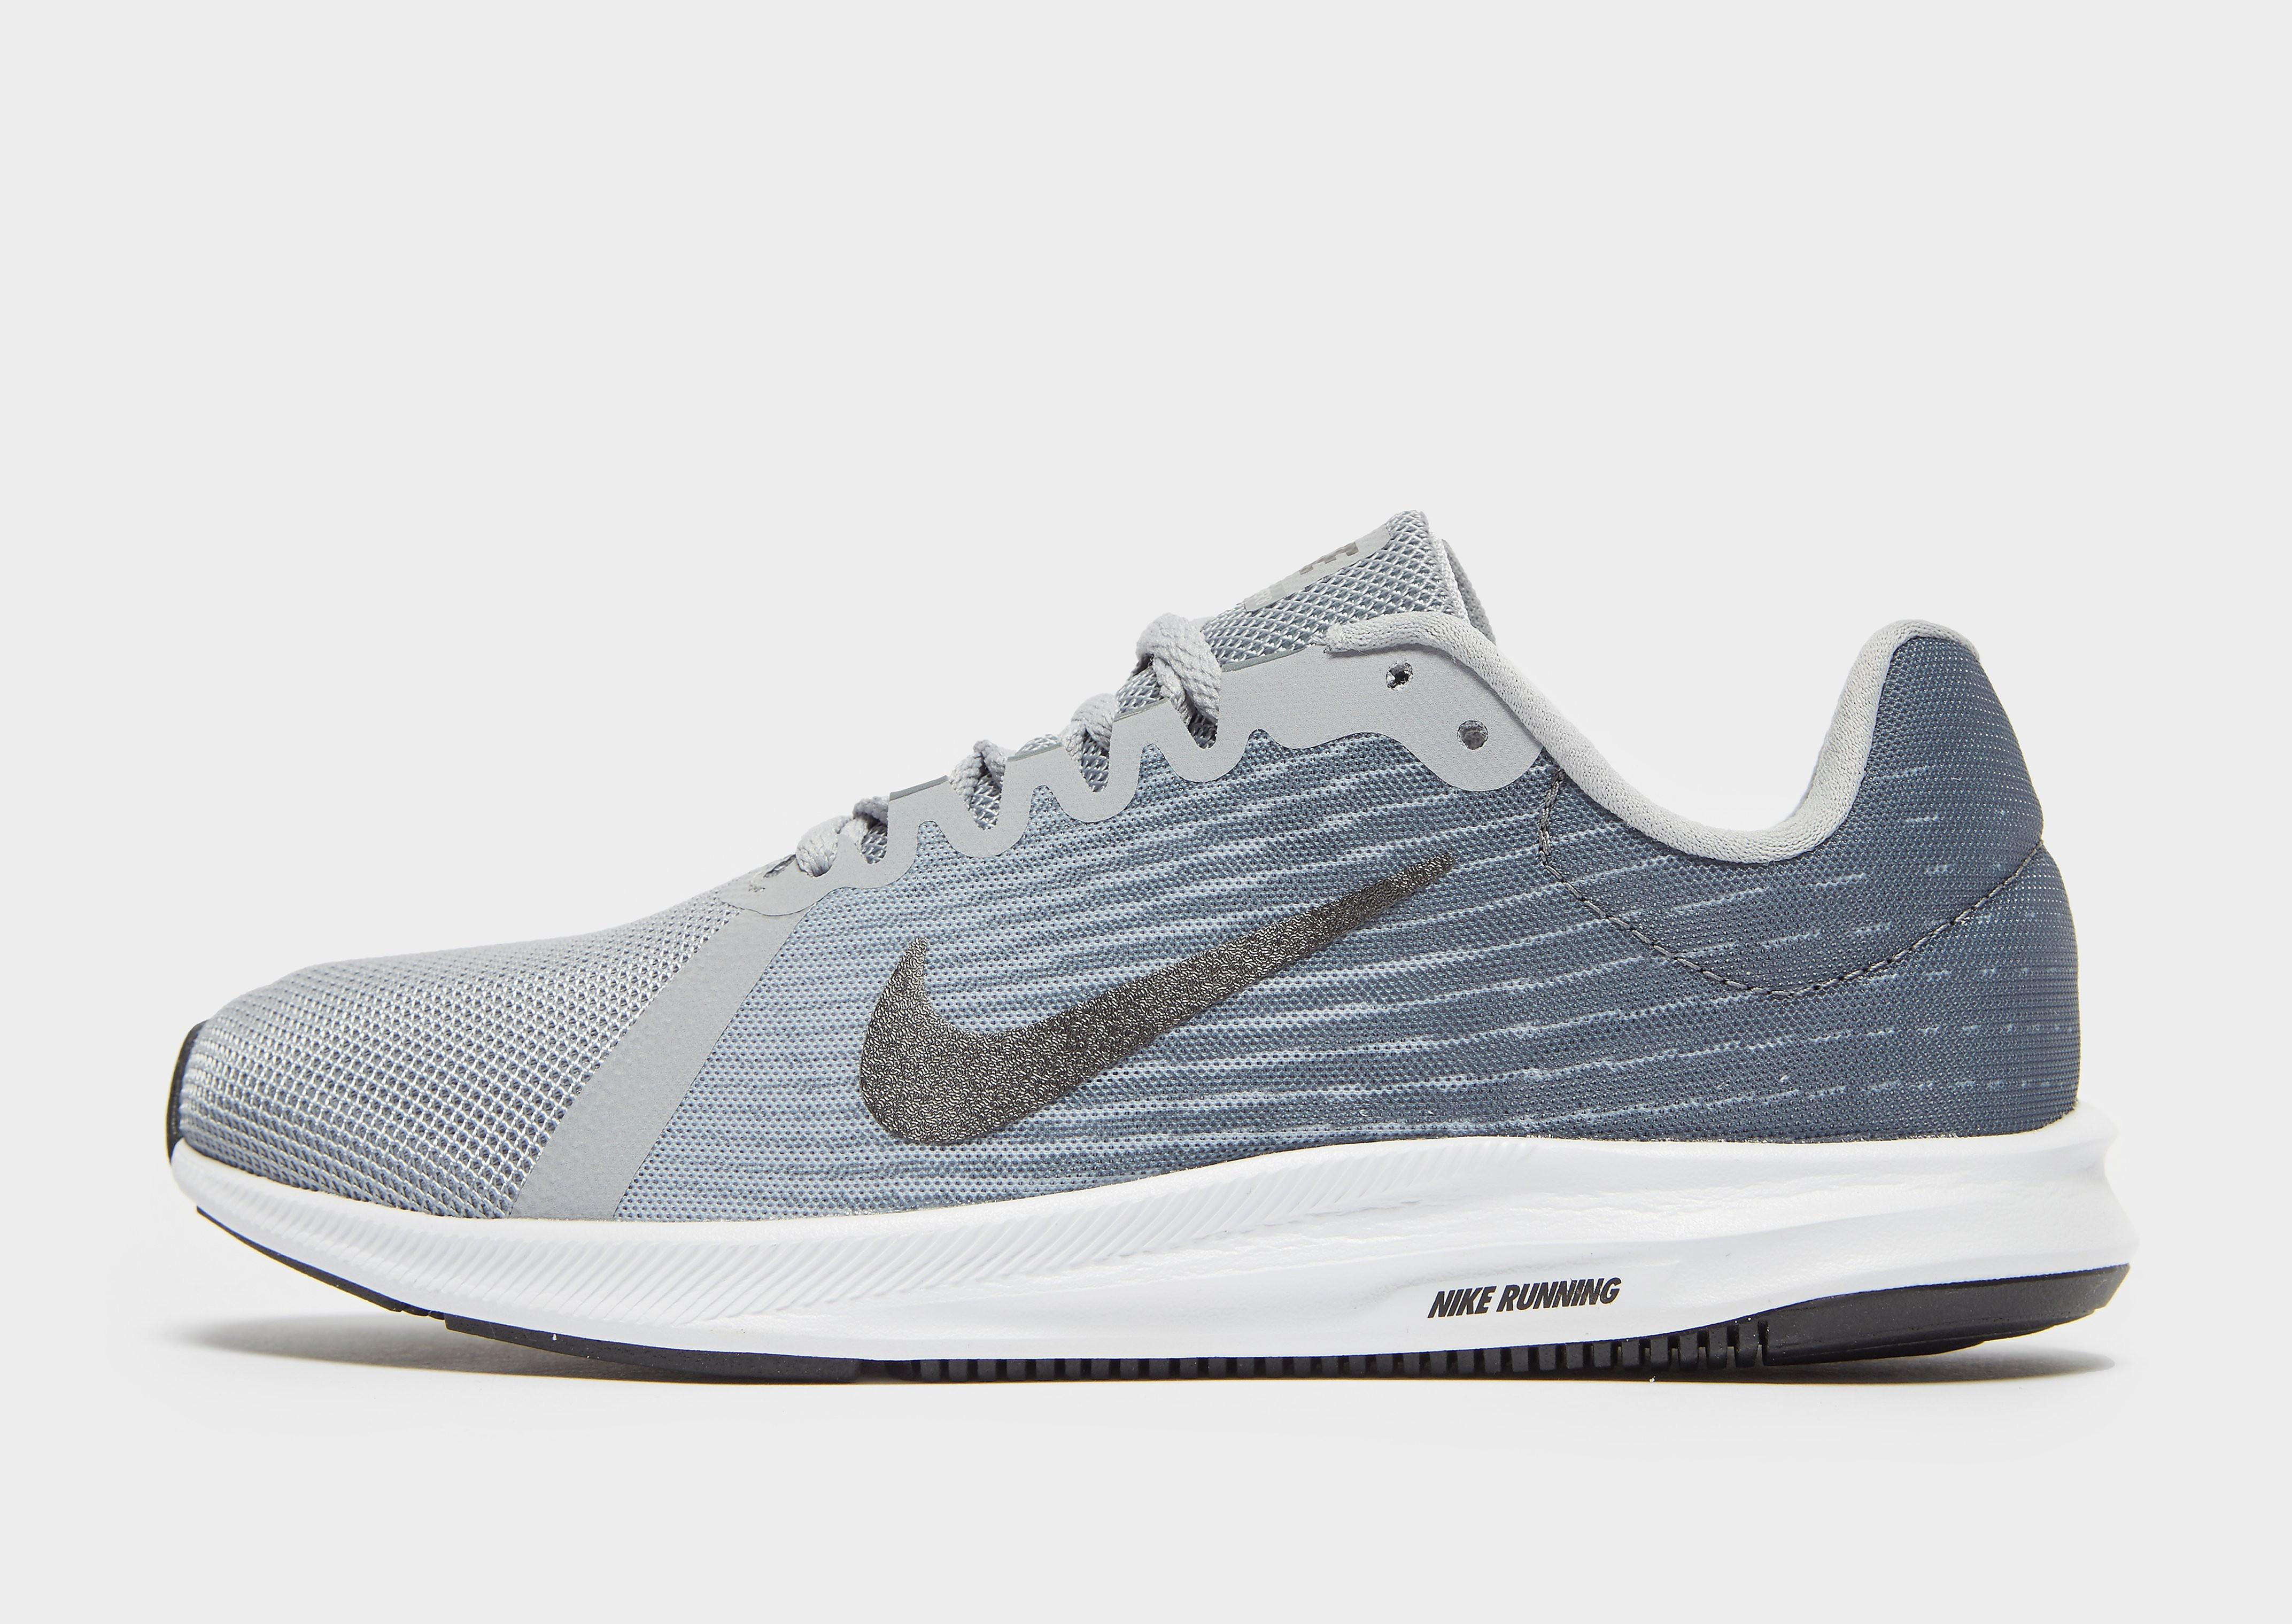 Nike Downshifter 7 Dames - Grijs - Dames